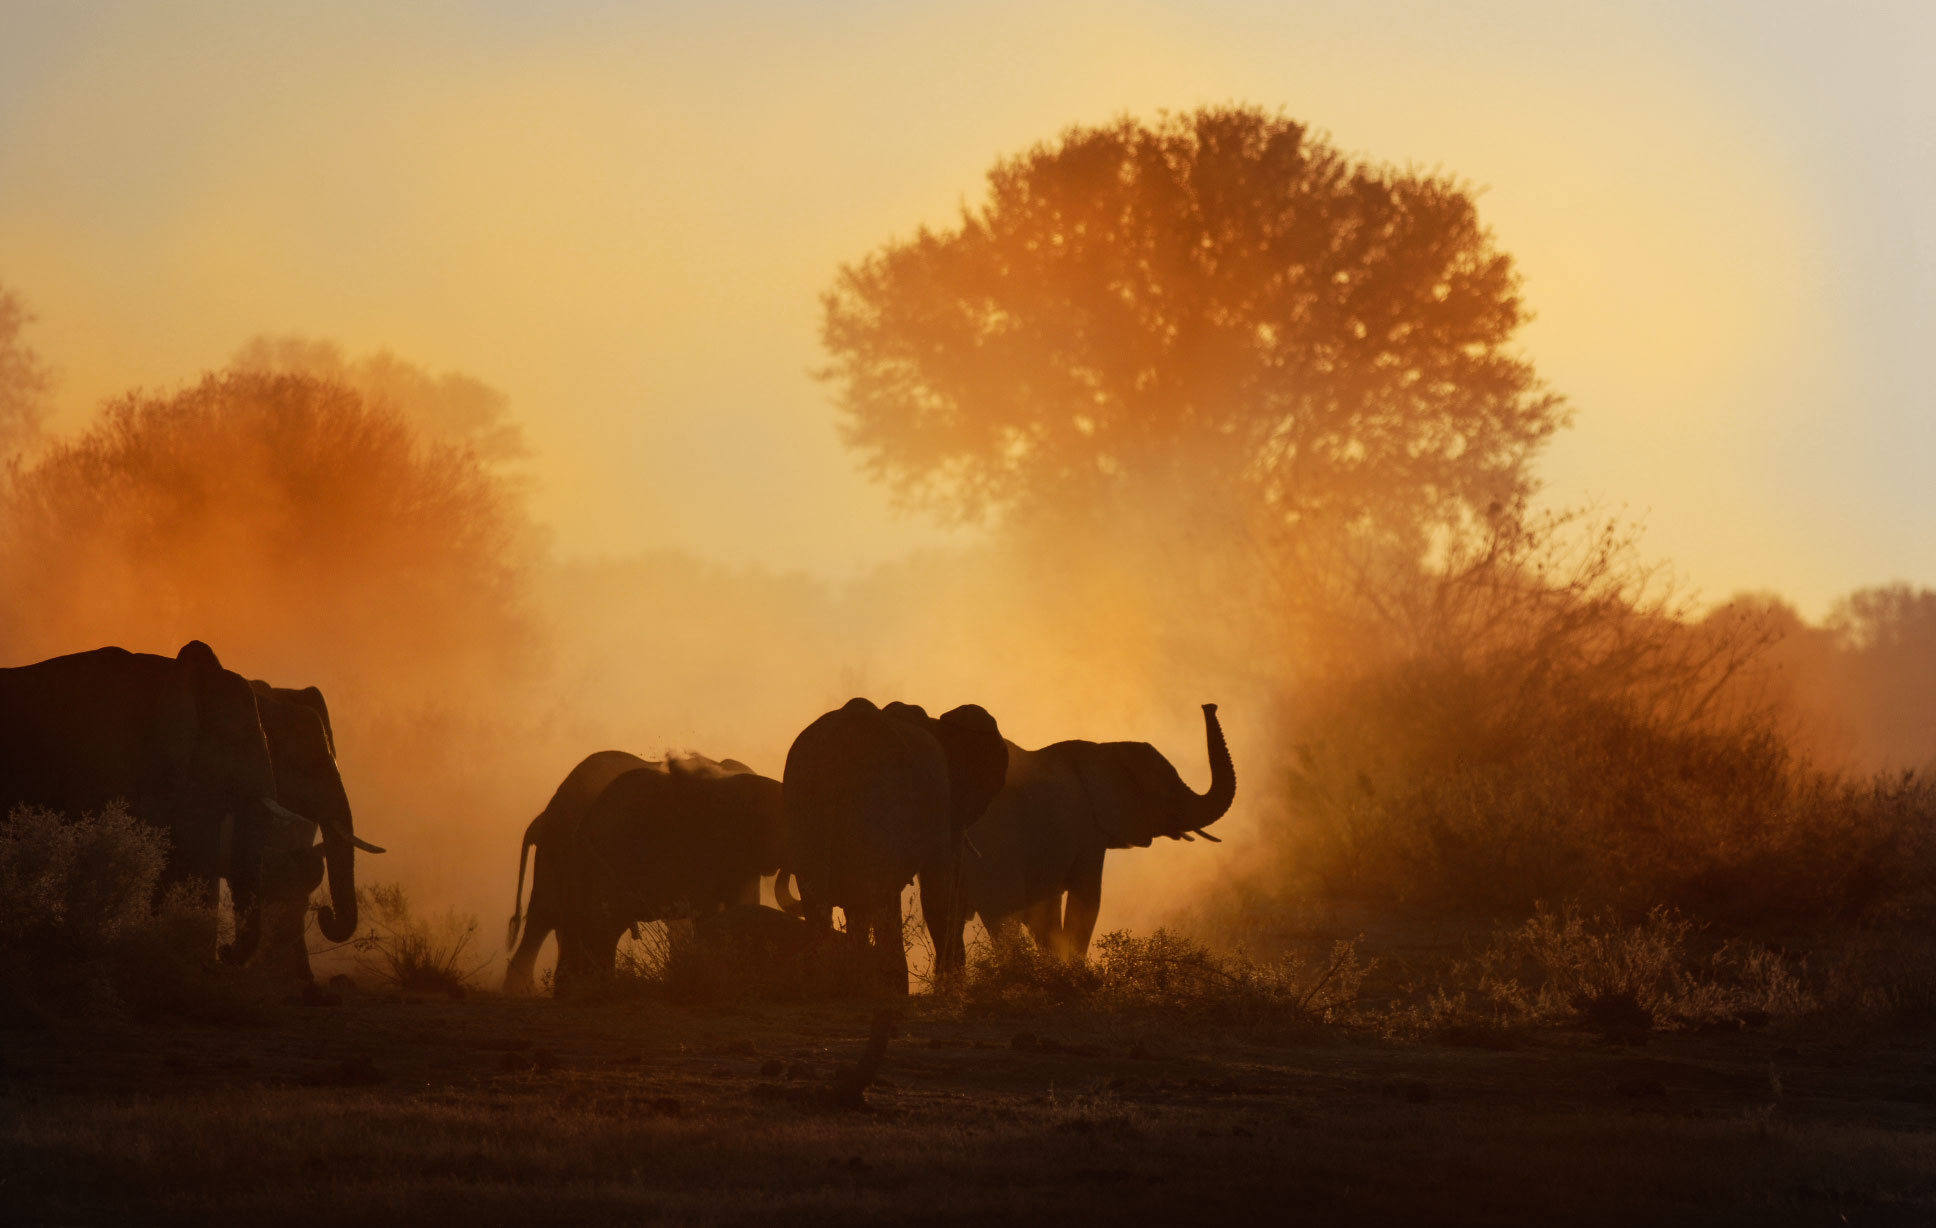 Herd-Elephants-N-Botswana1.jpg